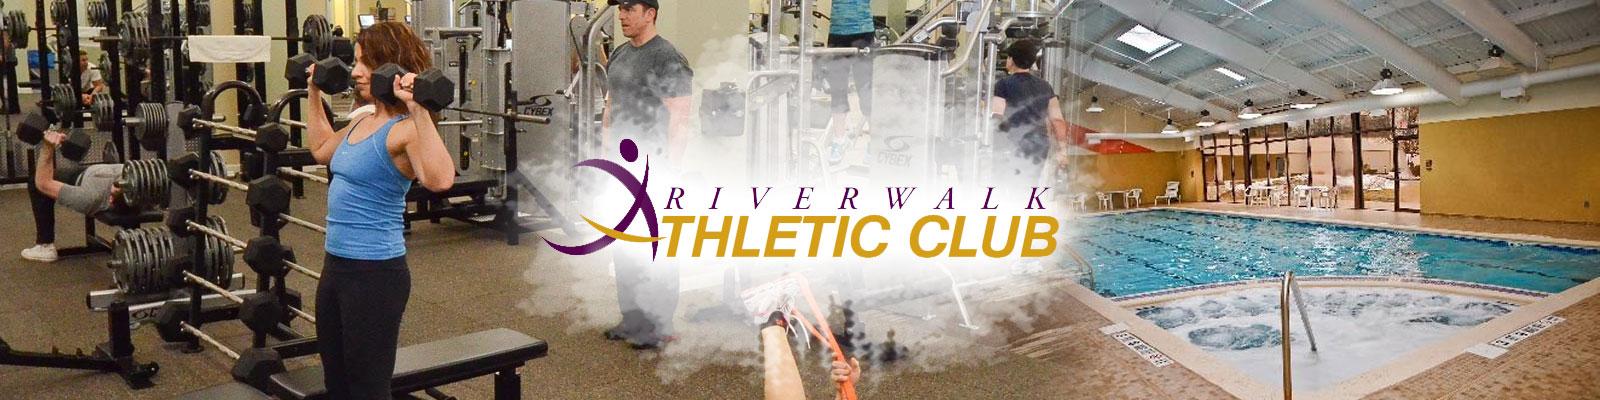 Binghamton Riverwalk Athletic Club